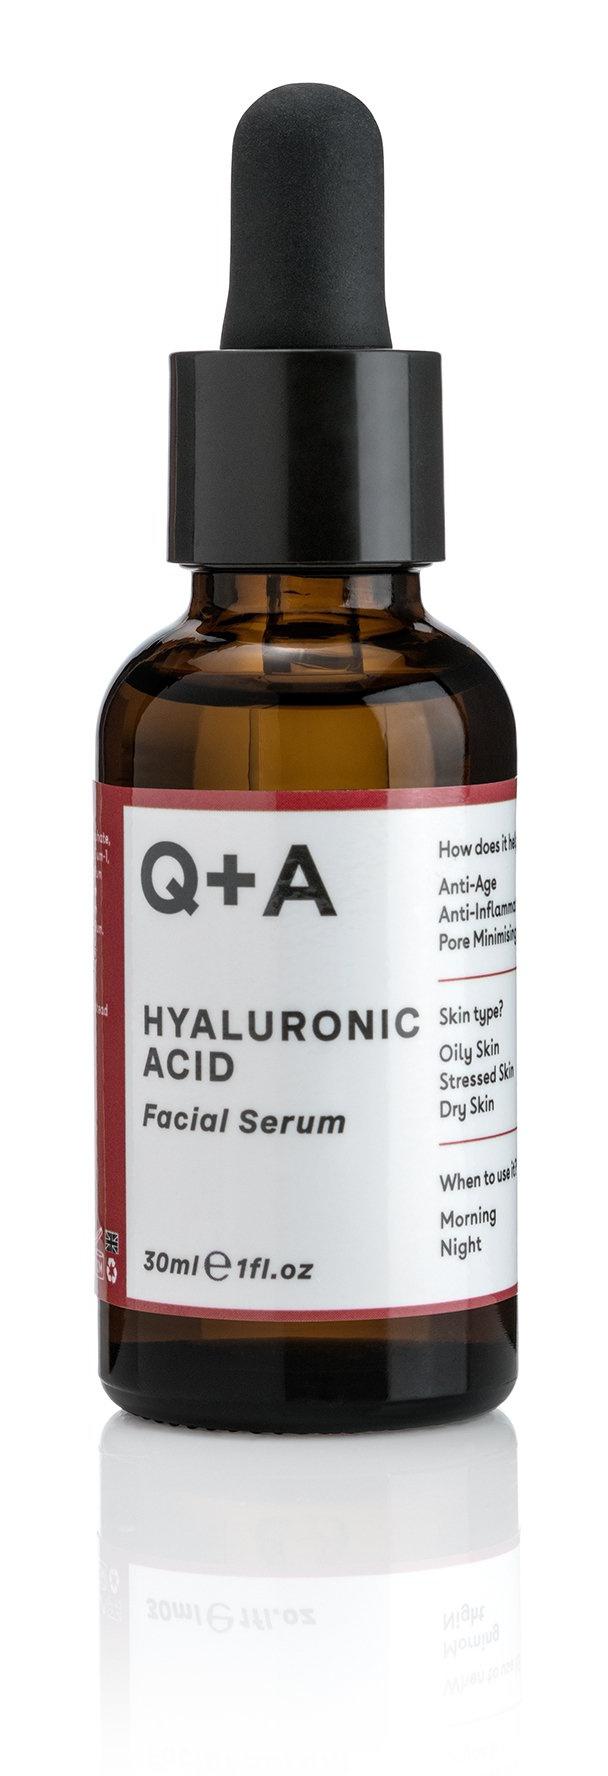 Q+A Hyaluronic Acid Facial Serum